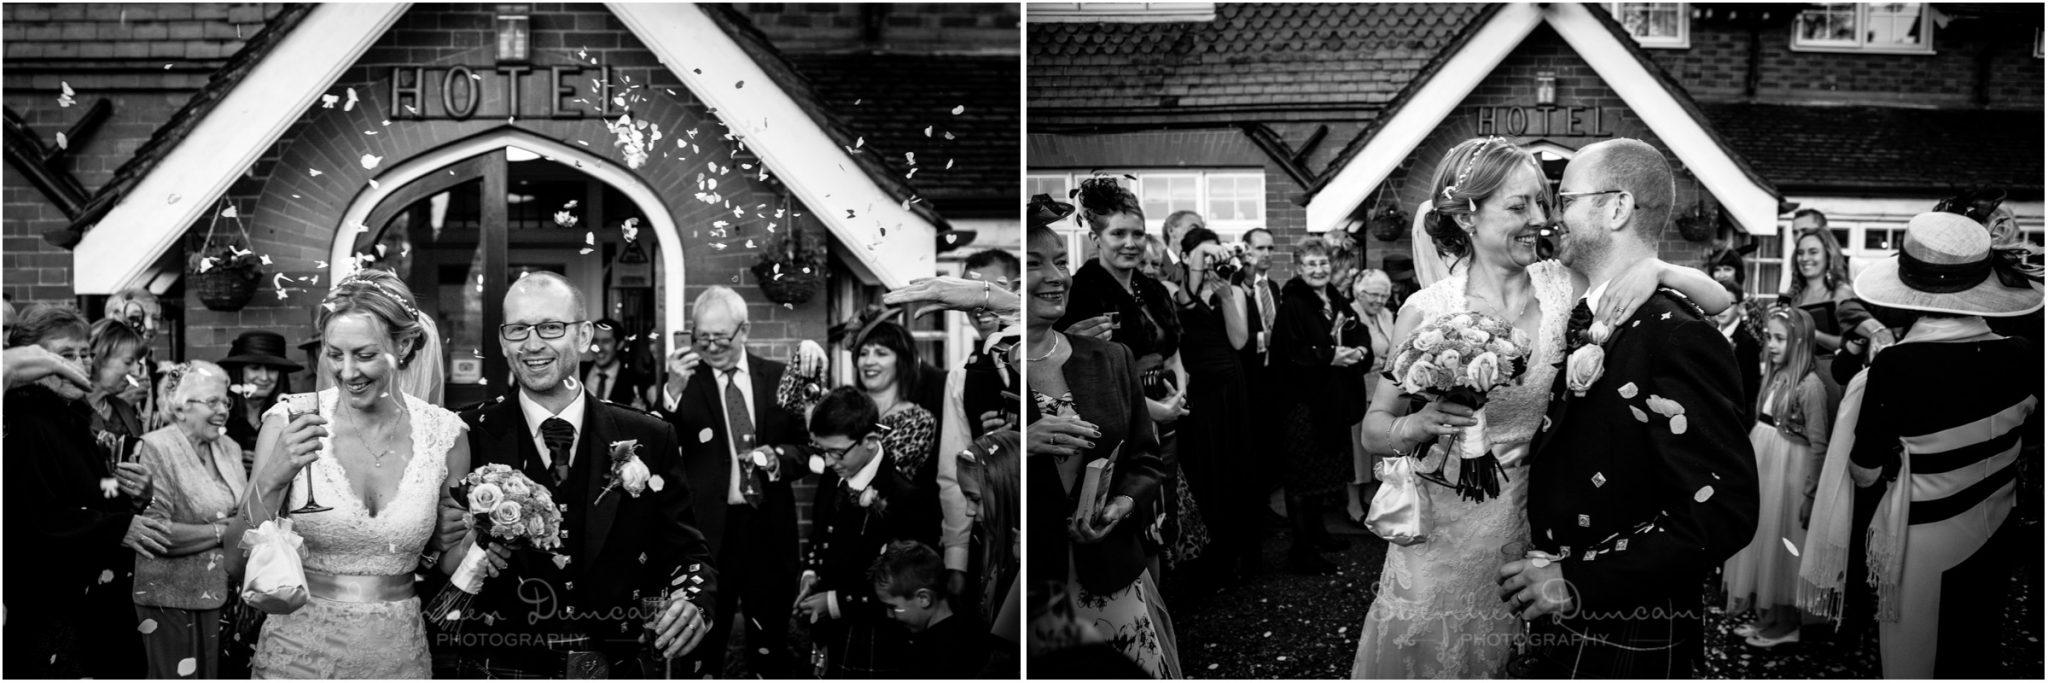 Romsey Abbey wedding photographer black and white confetti photo